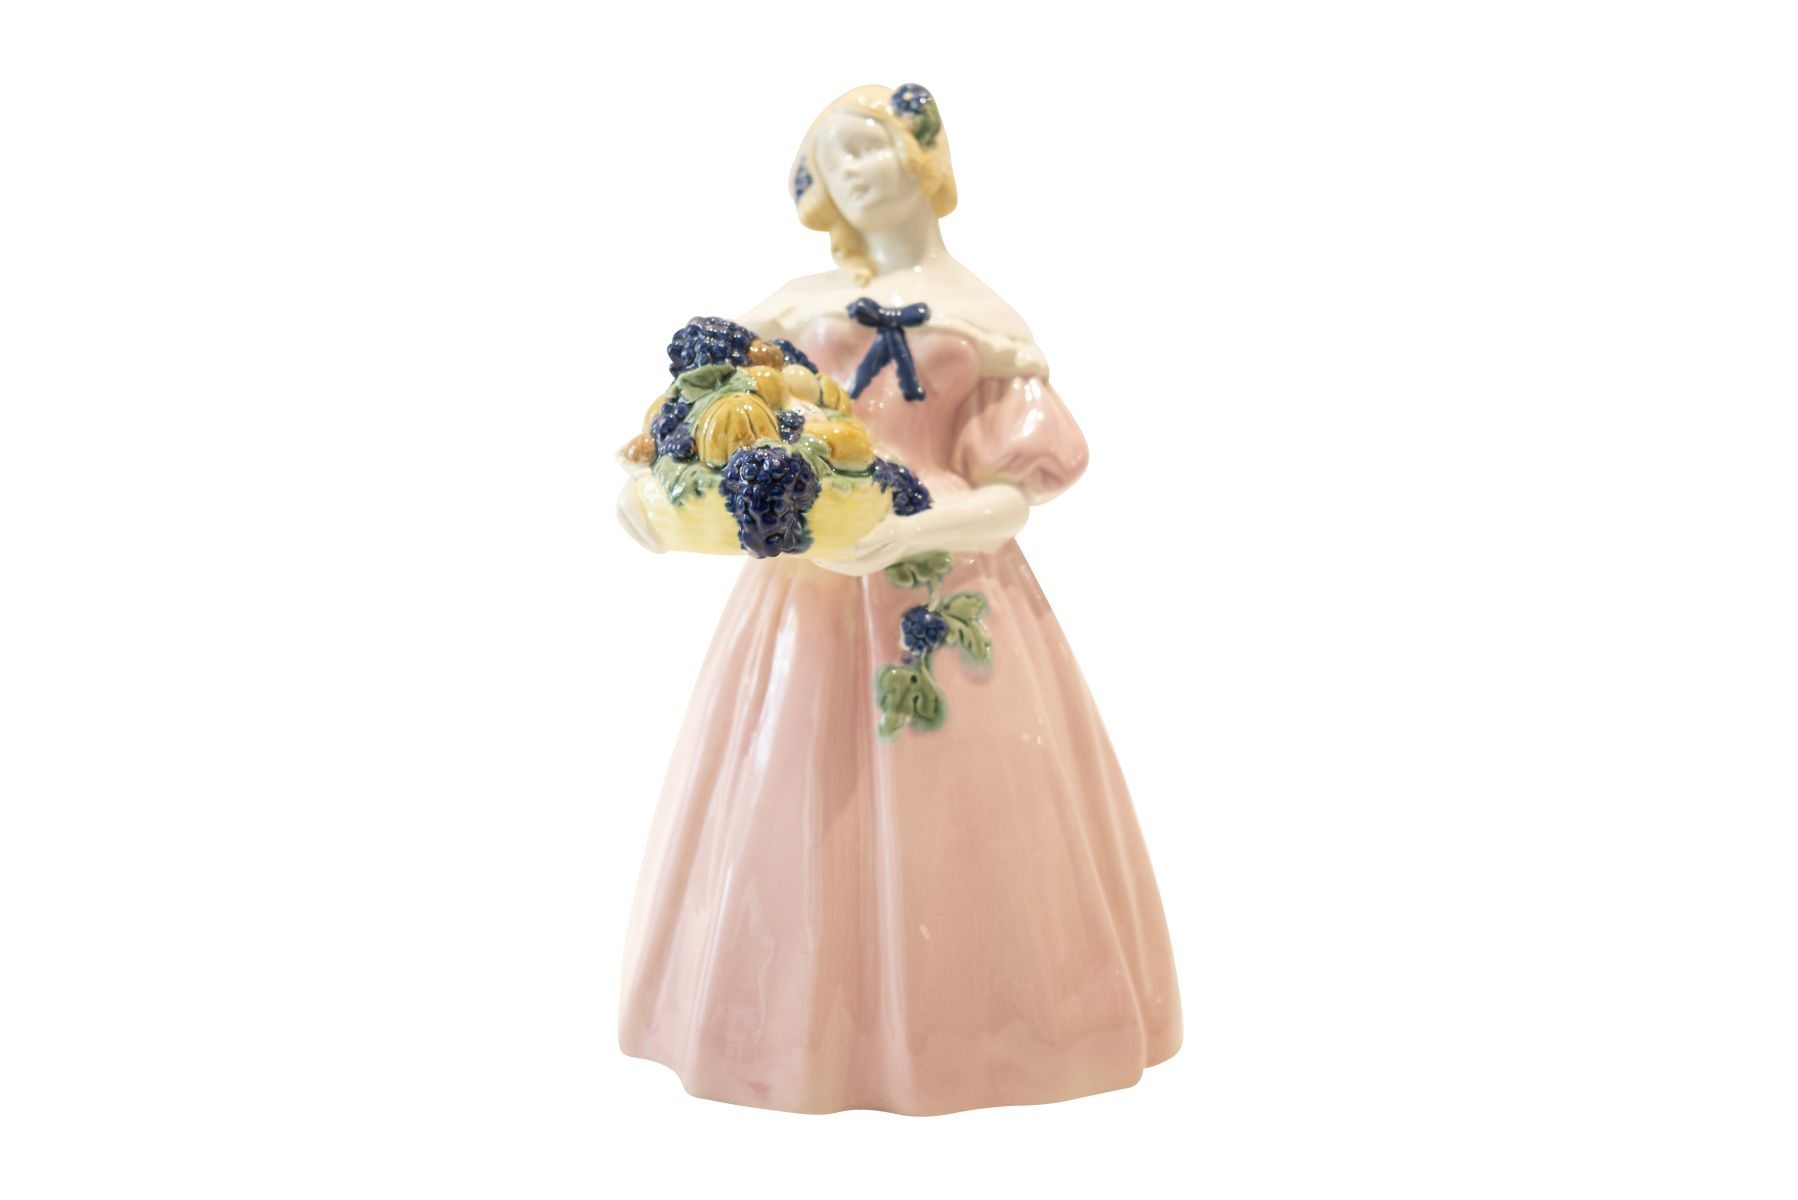 #179 Porcelain Figure, Crinoline Autmn, Around 1910 | Porzellanfigur, Krinoline Herbst, um 1910 Image